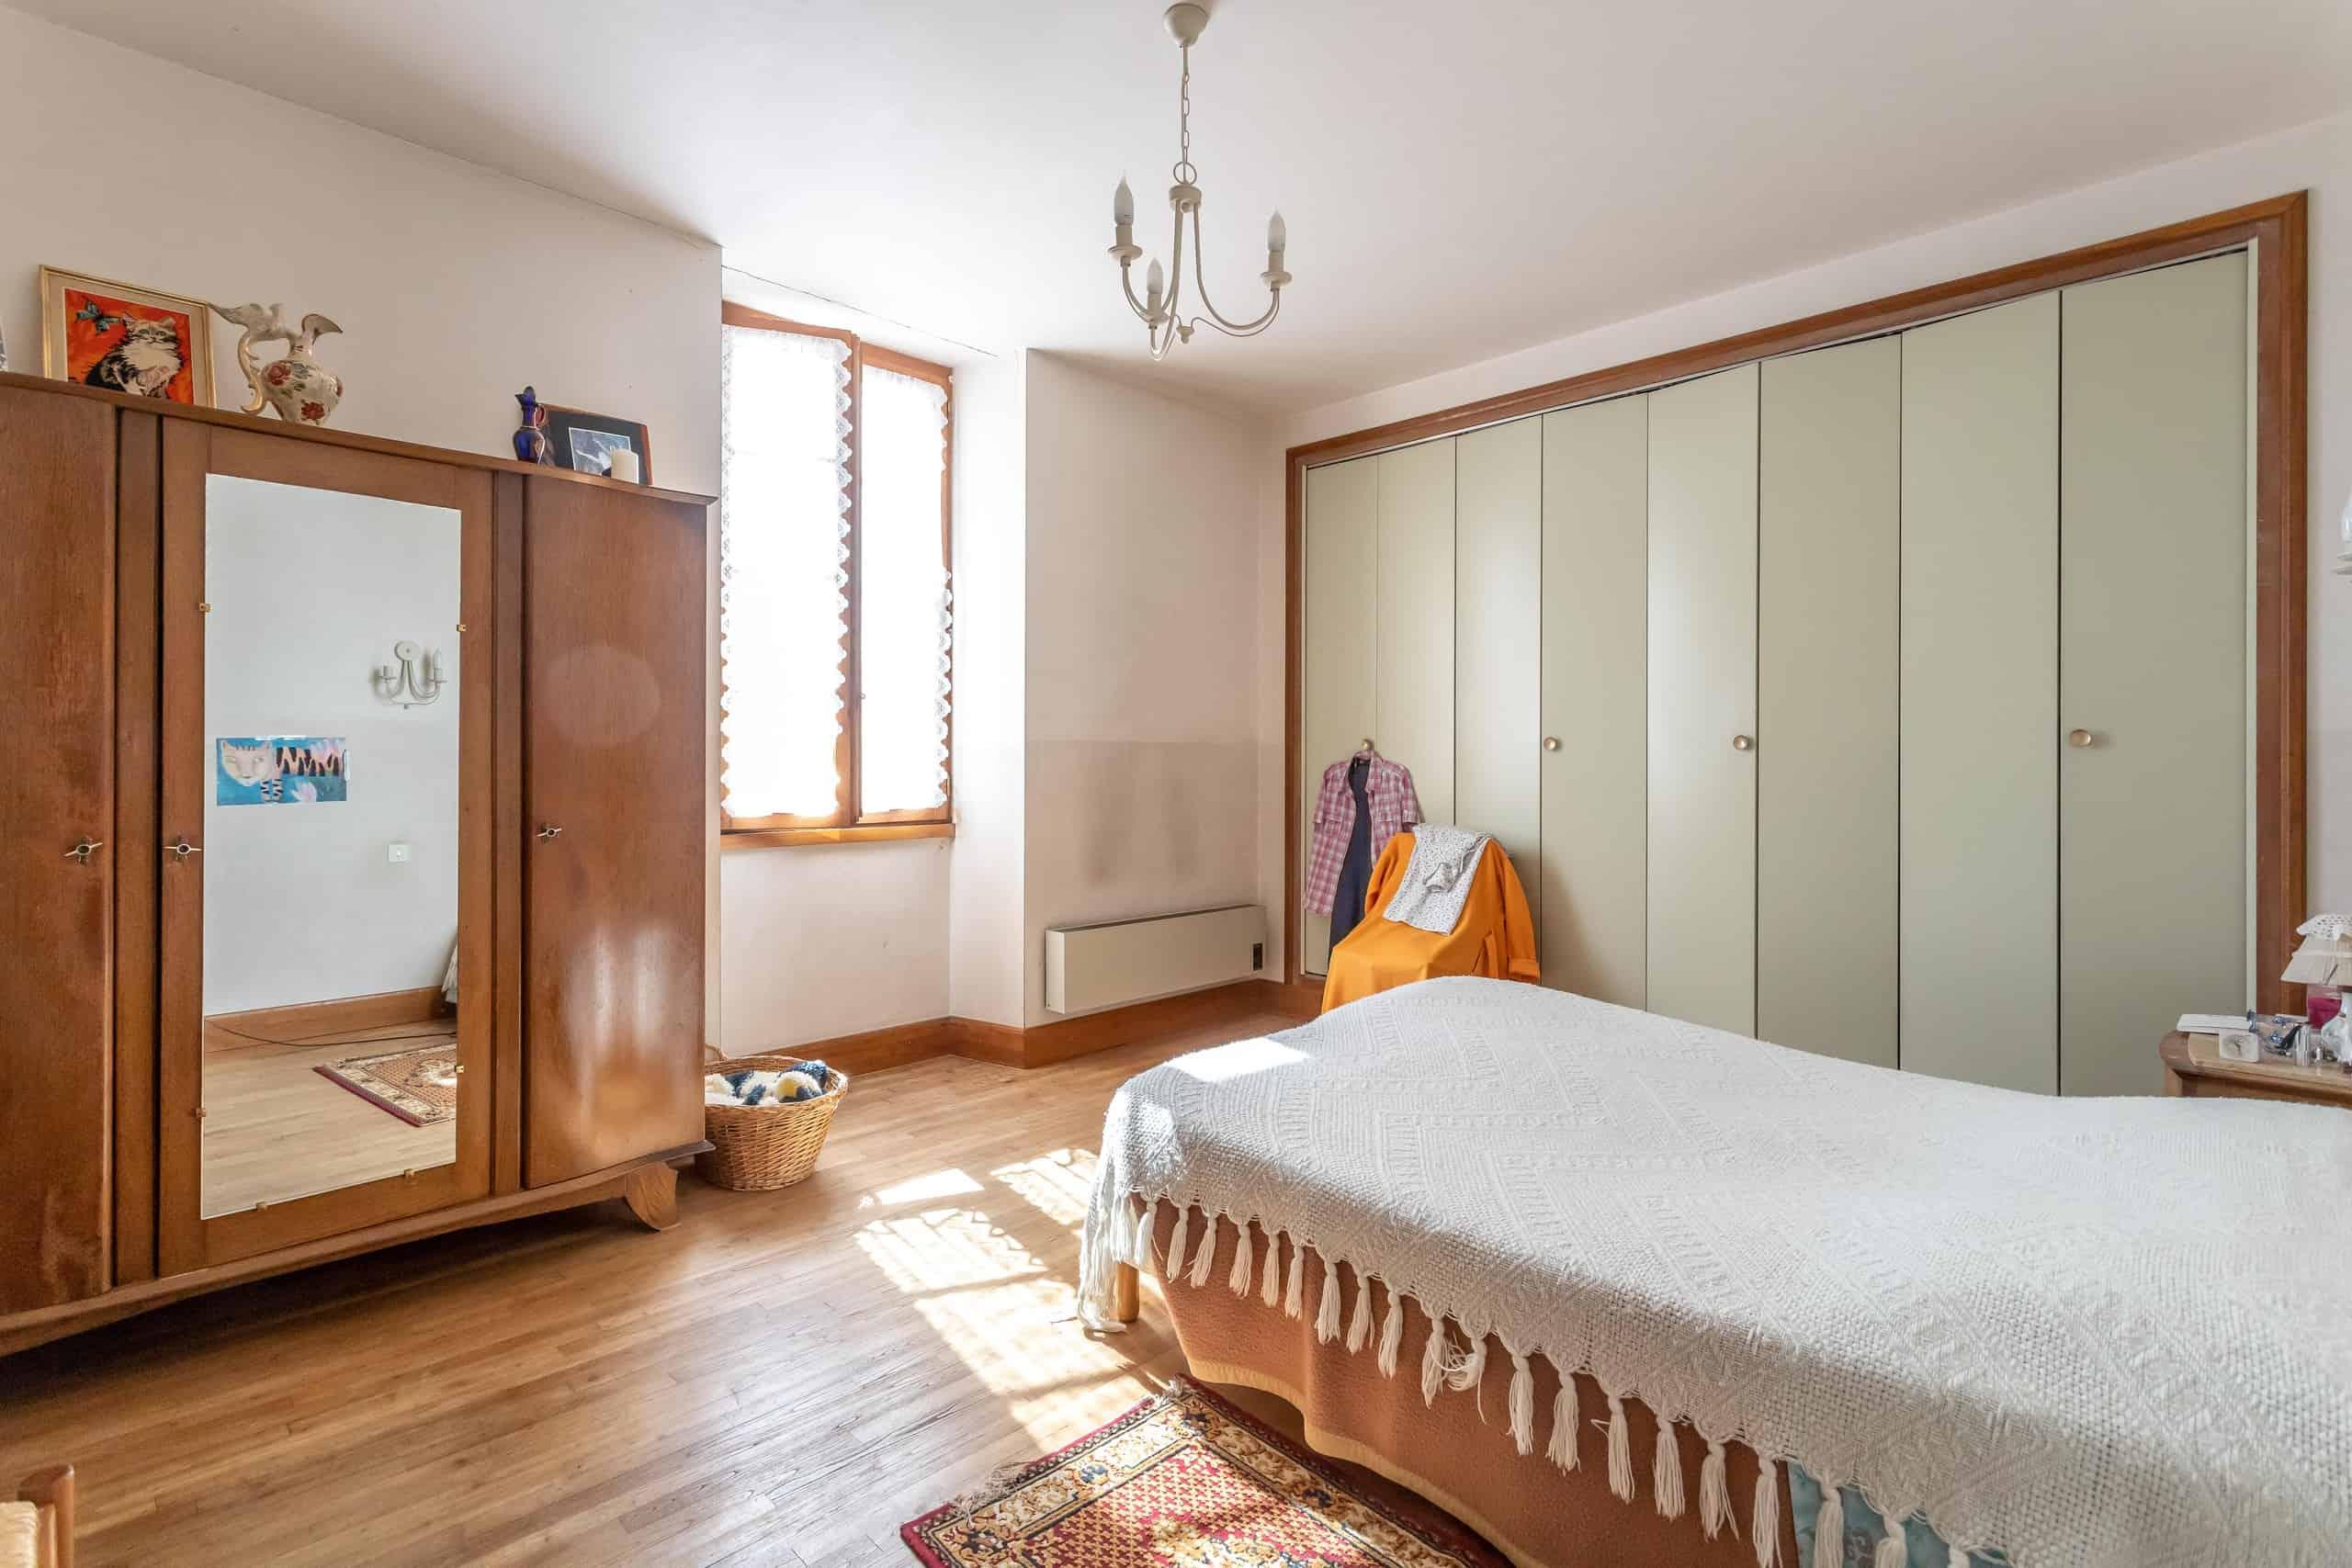 Bedroom-Wardrobe-WMC074